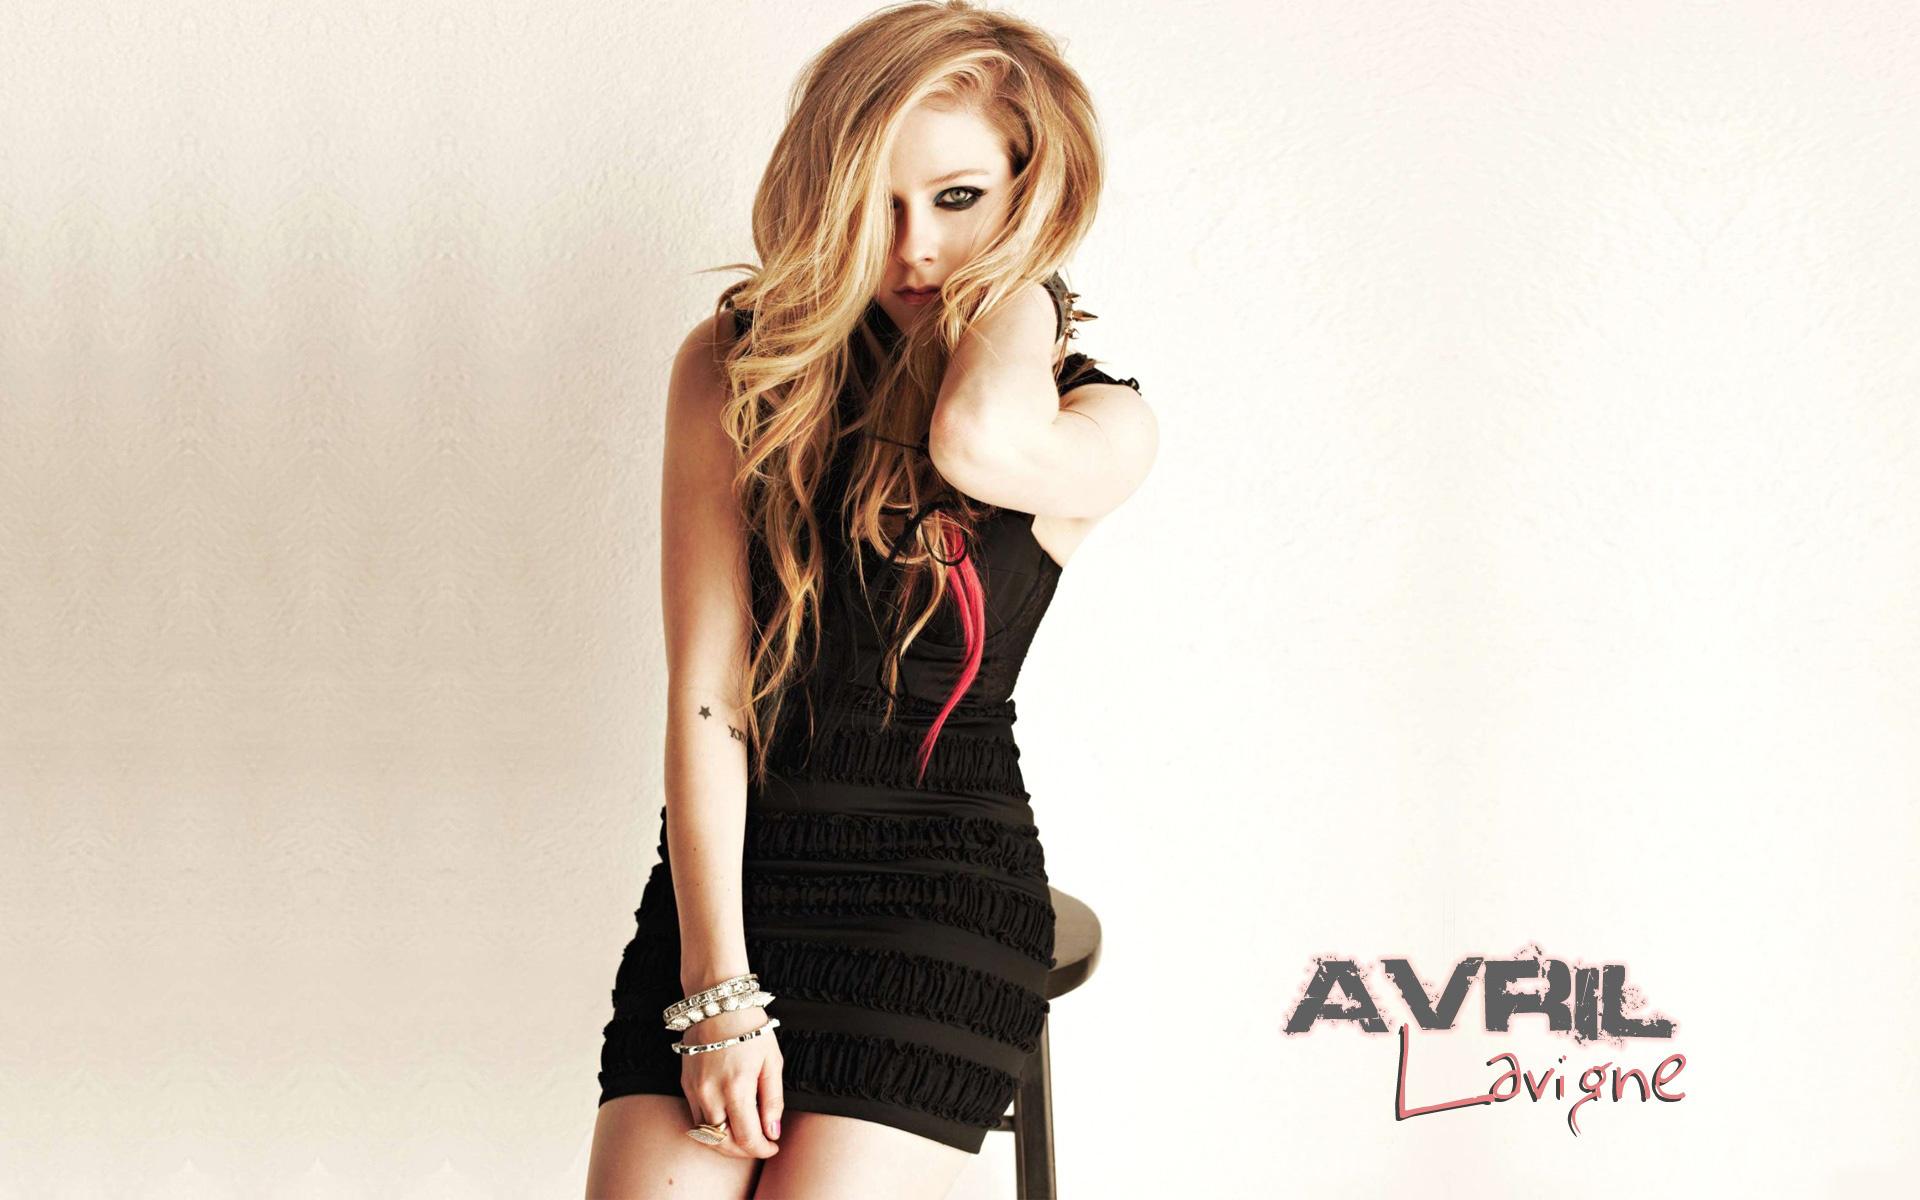 Avril Lavigne 46 wallpaper